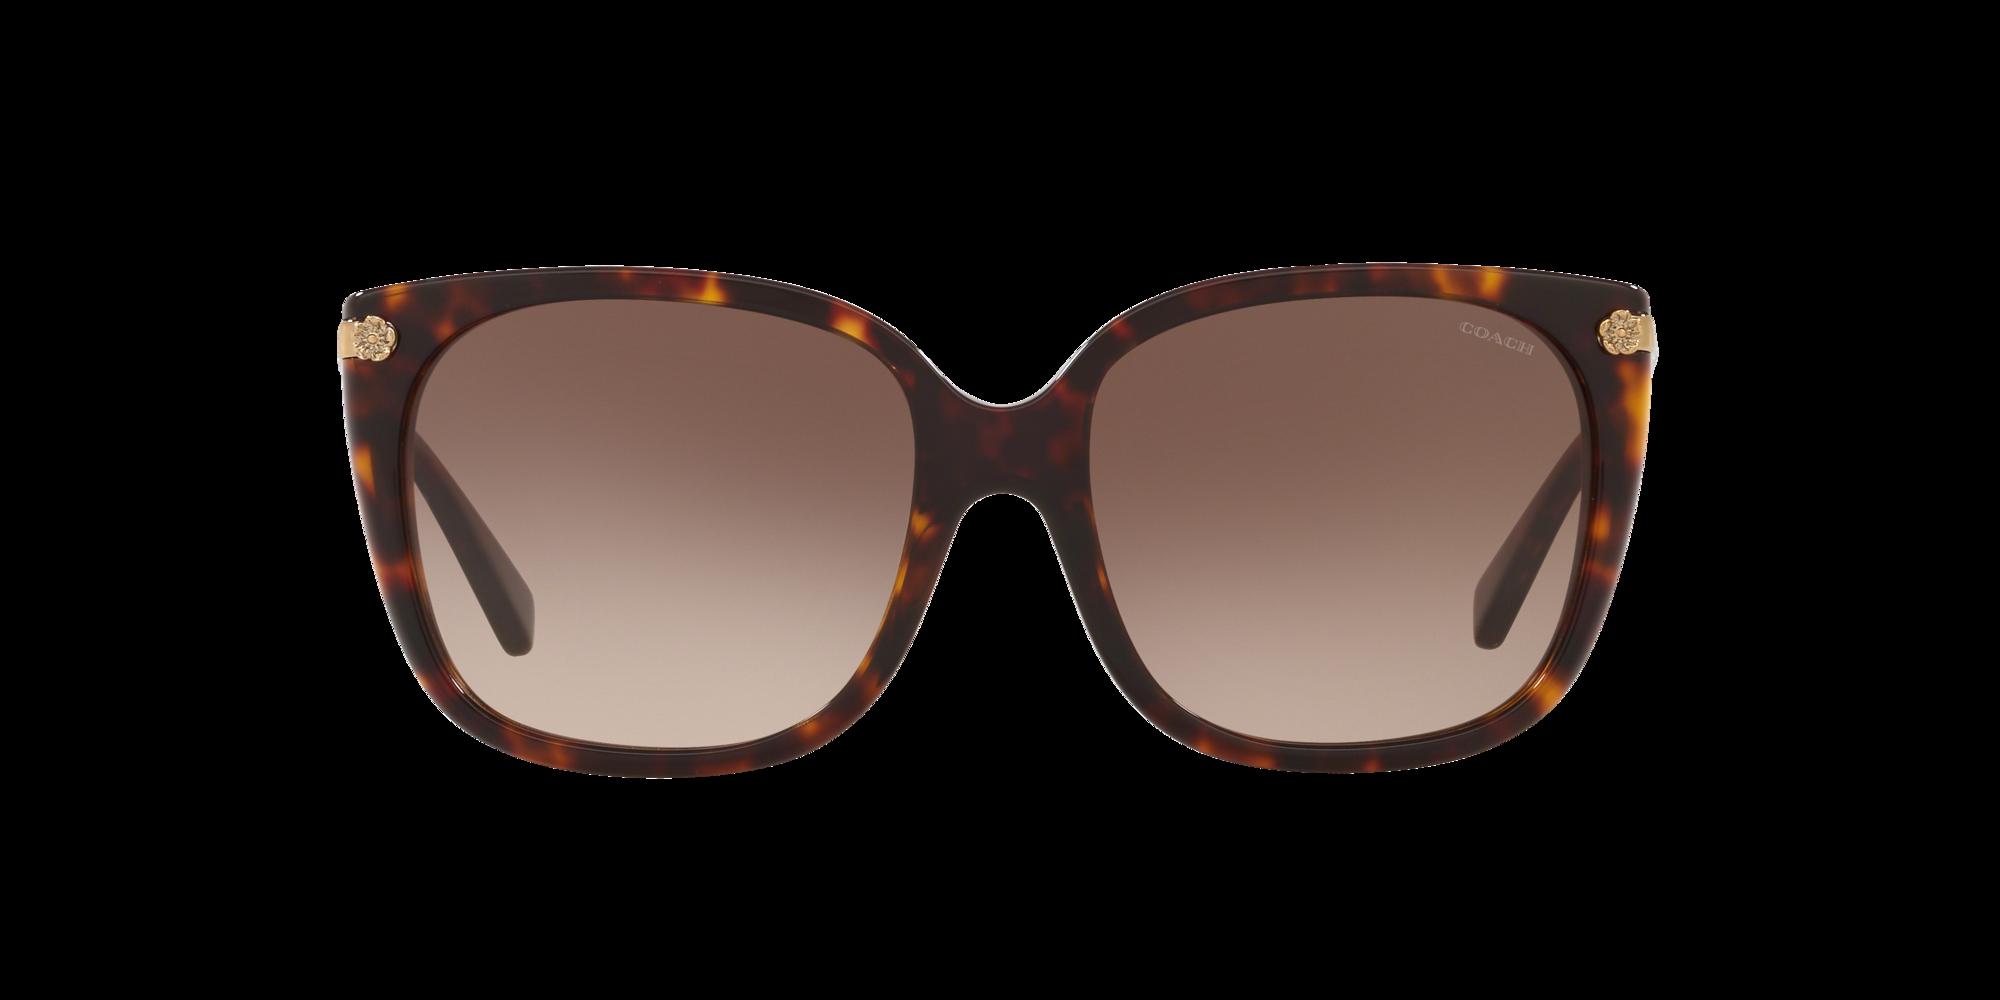 Image for HC8272 56 L1097 from LensCrafters   Glasses, Prescription Glasses Online, Eyewear